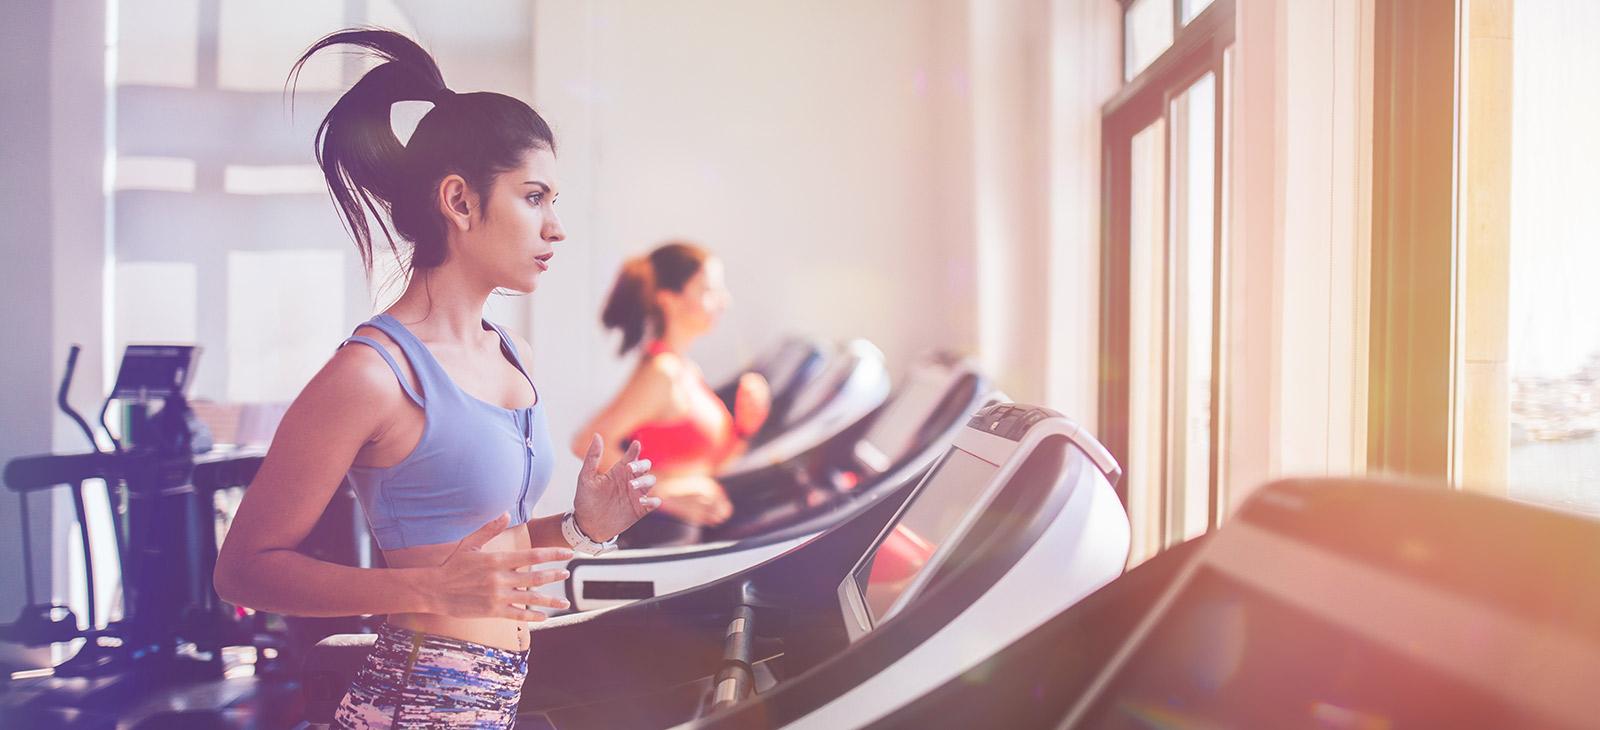 Frauen auf dem Laufband im Fitness-Loft